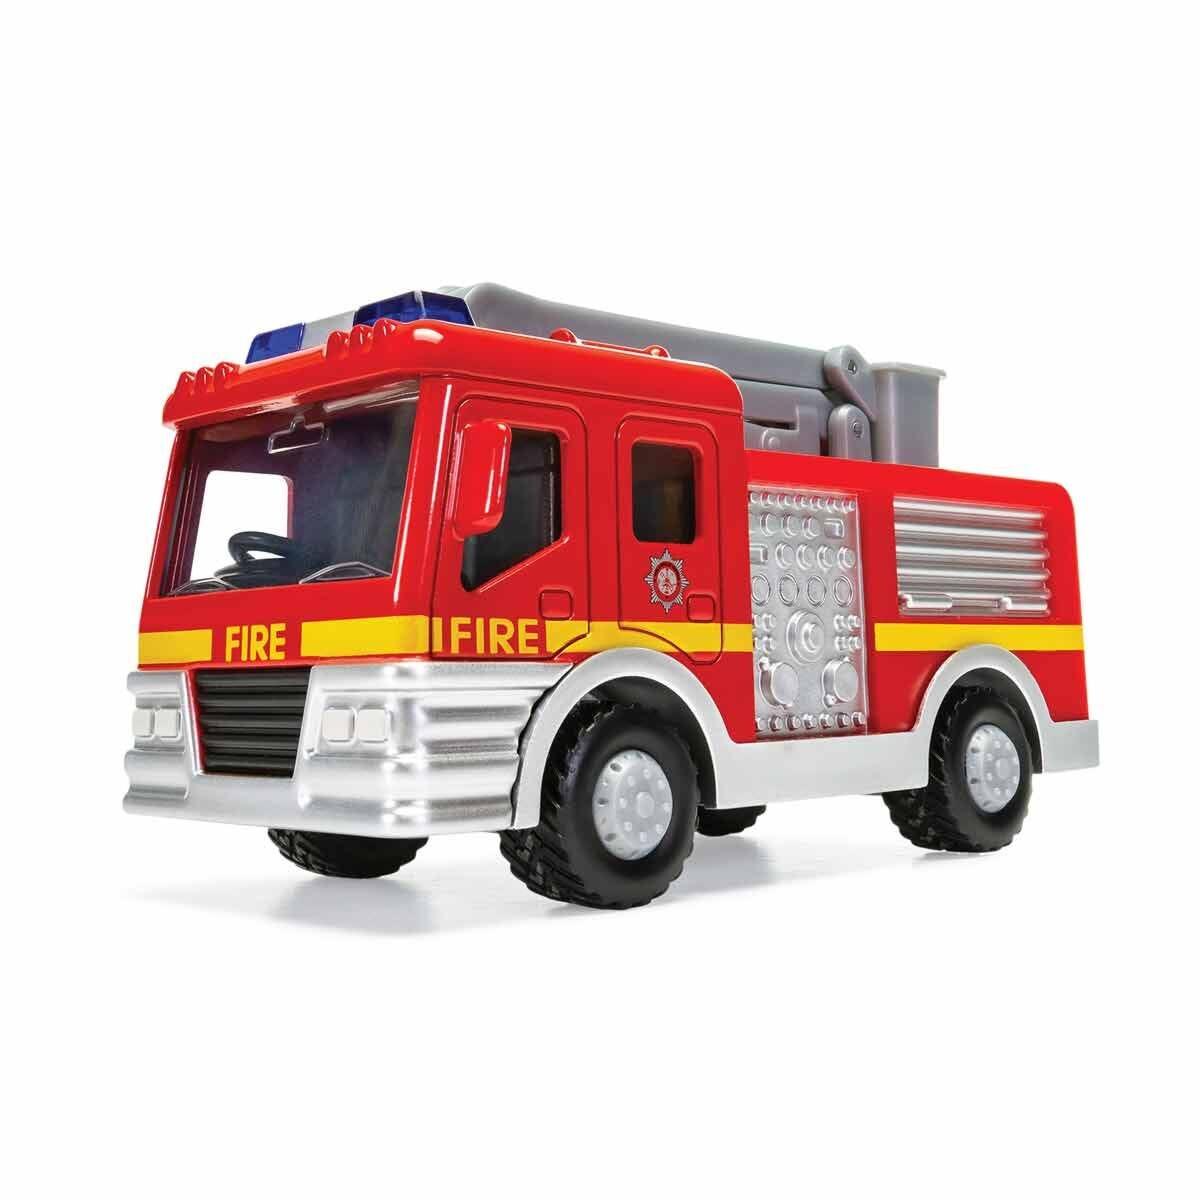 Corgi Chunkies Fire Crane Truck